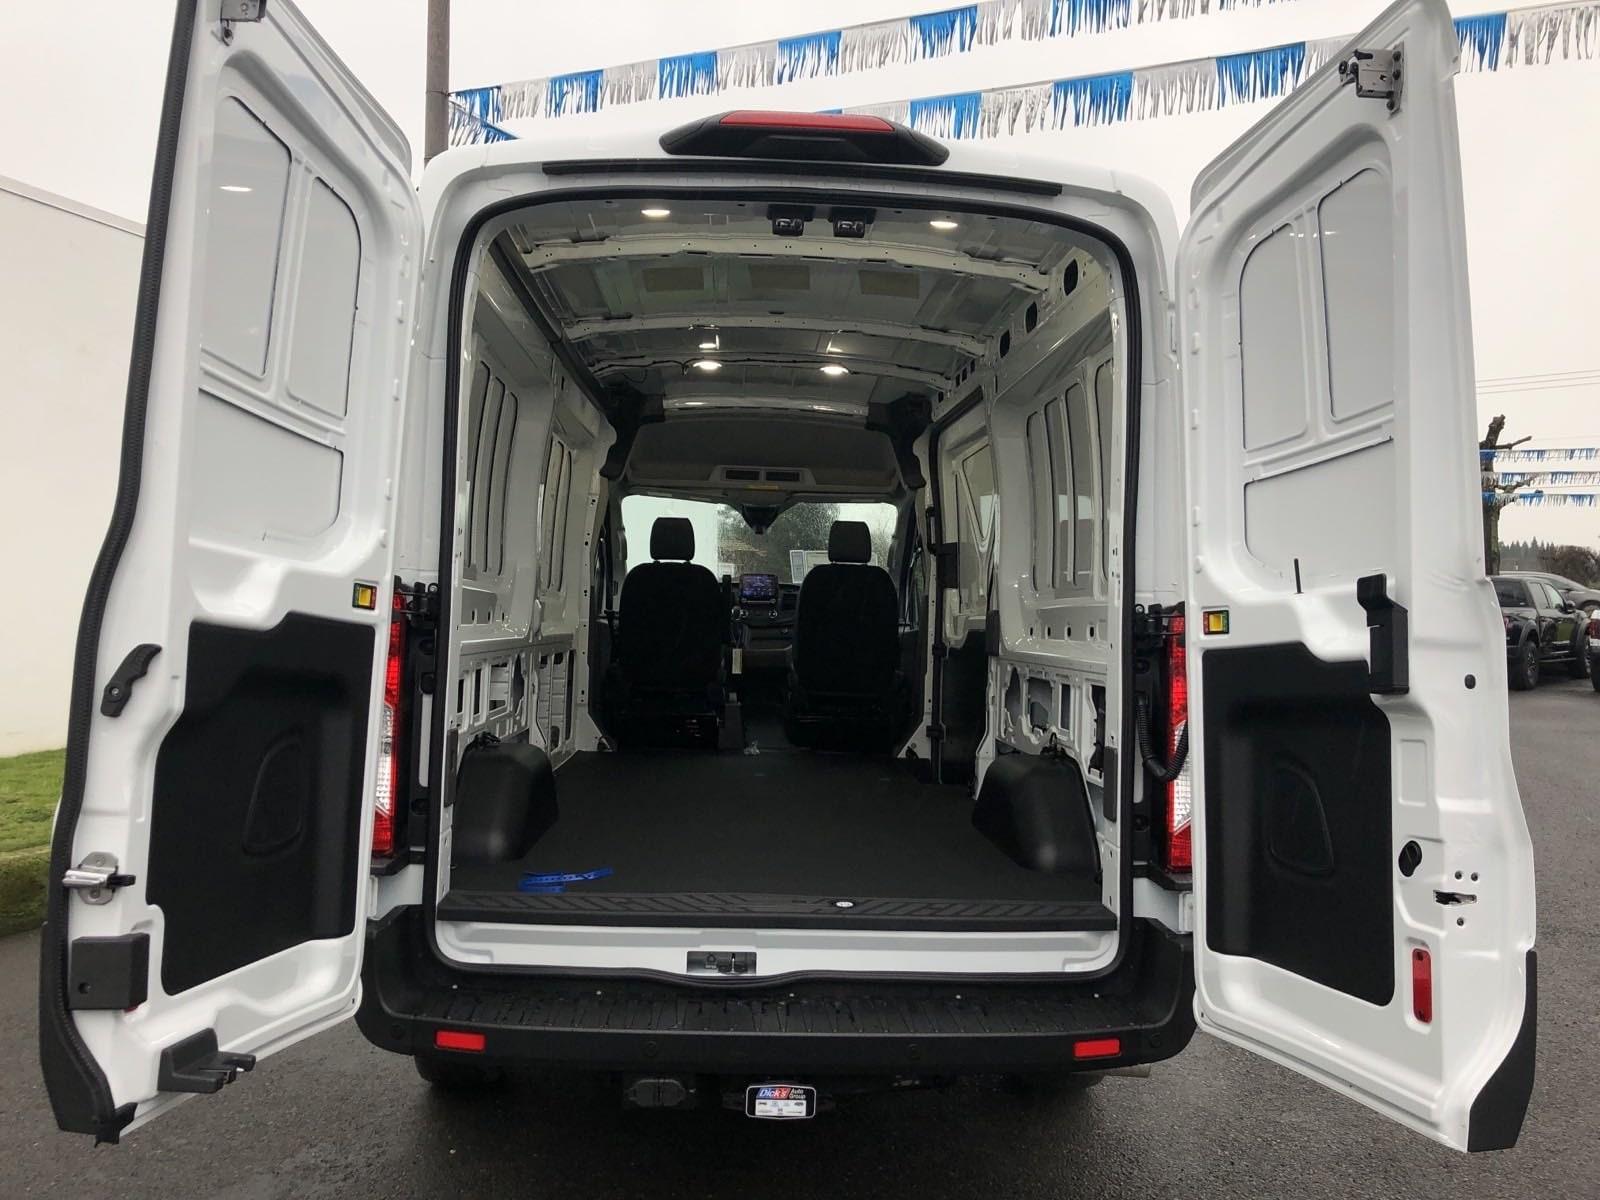 2020 Transit 250 Med Roof RWD, Empty Cargo Van #208522 - photo 1